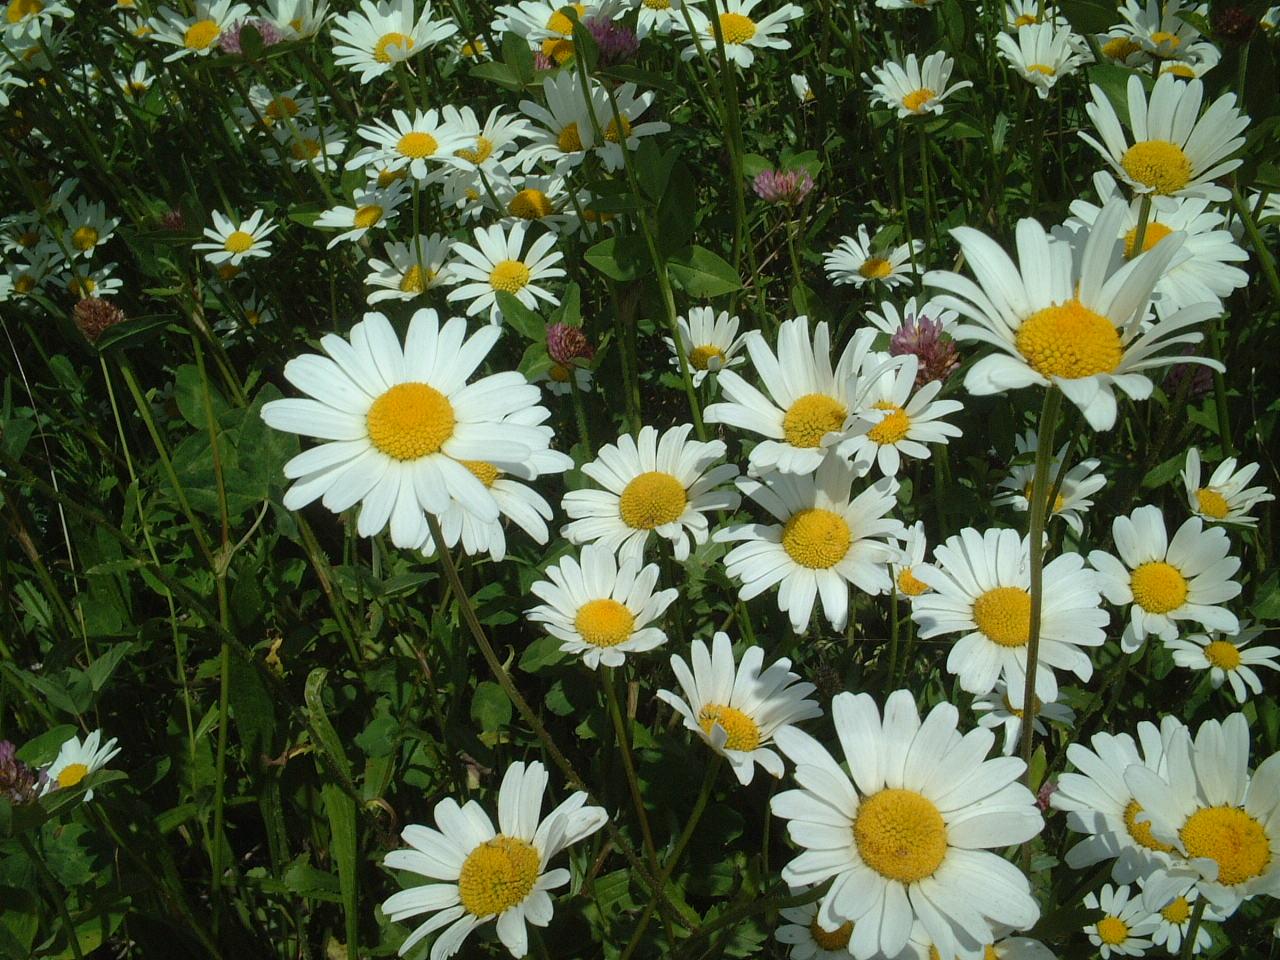 Macro Of Marguerite Daisy Flower Stock Photo - Image of